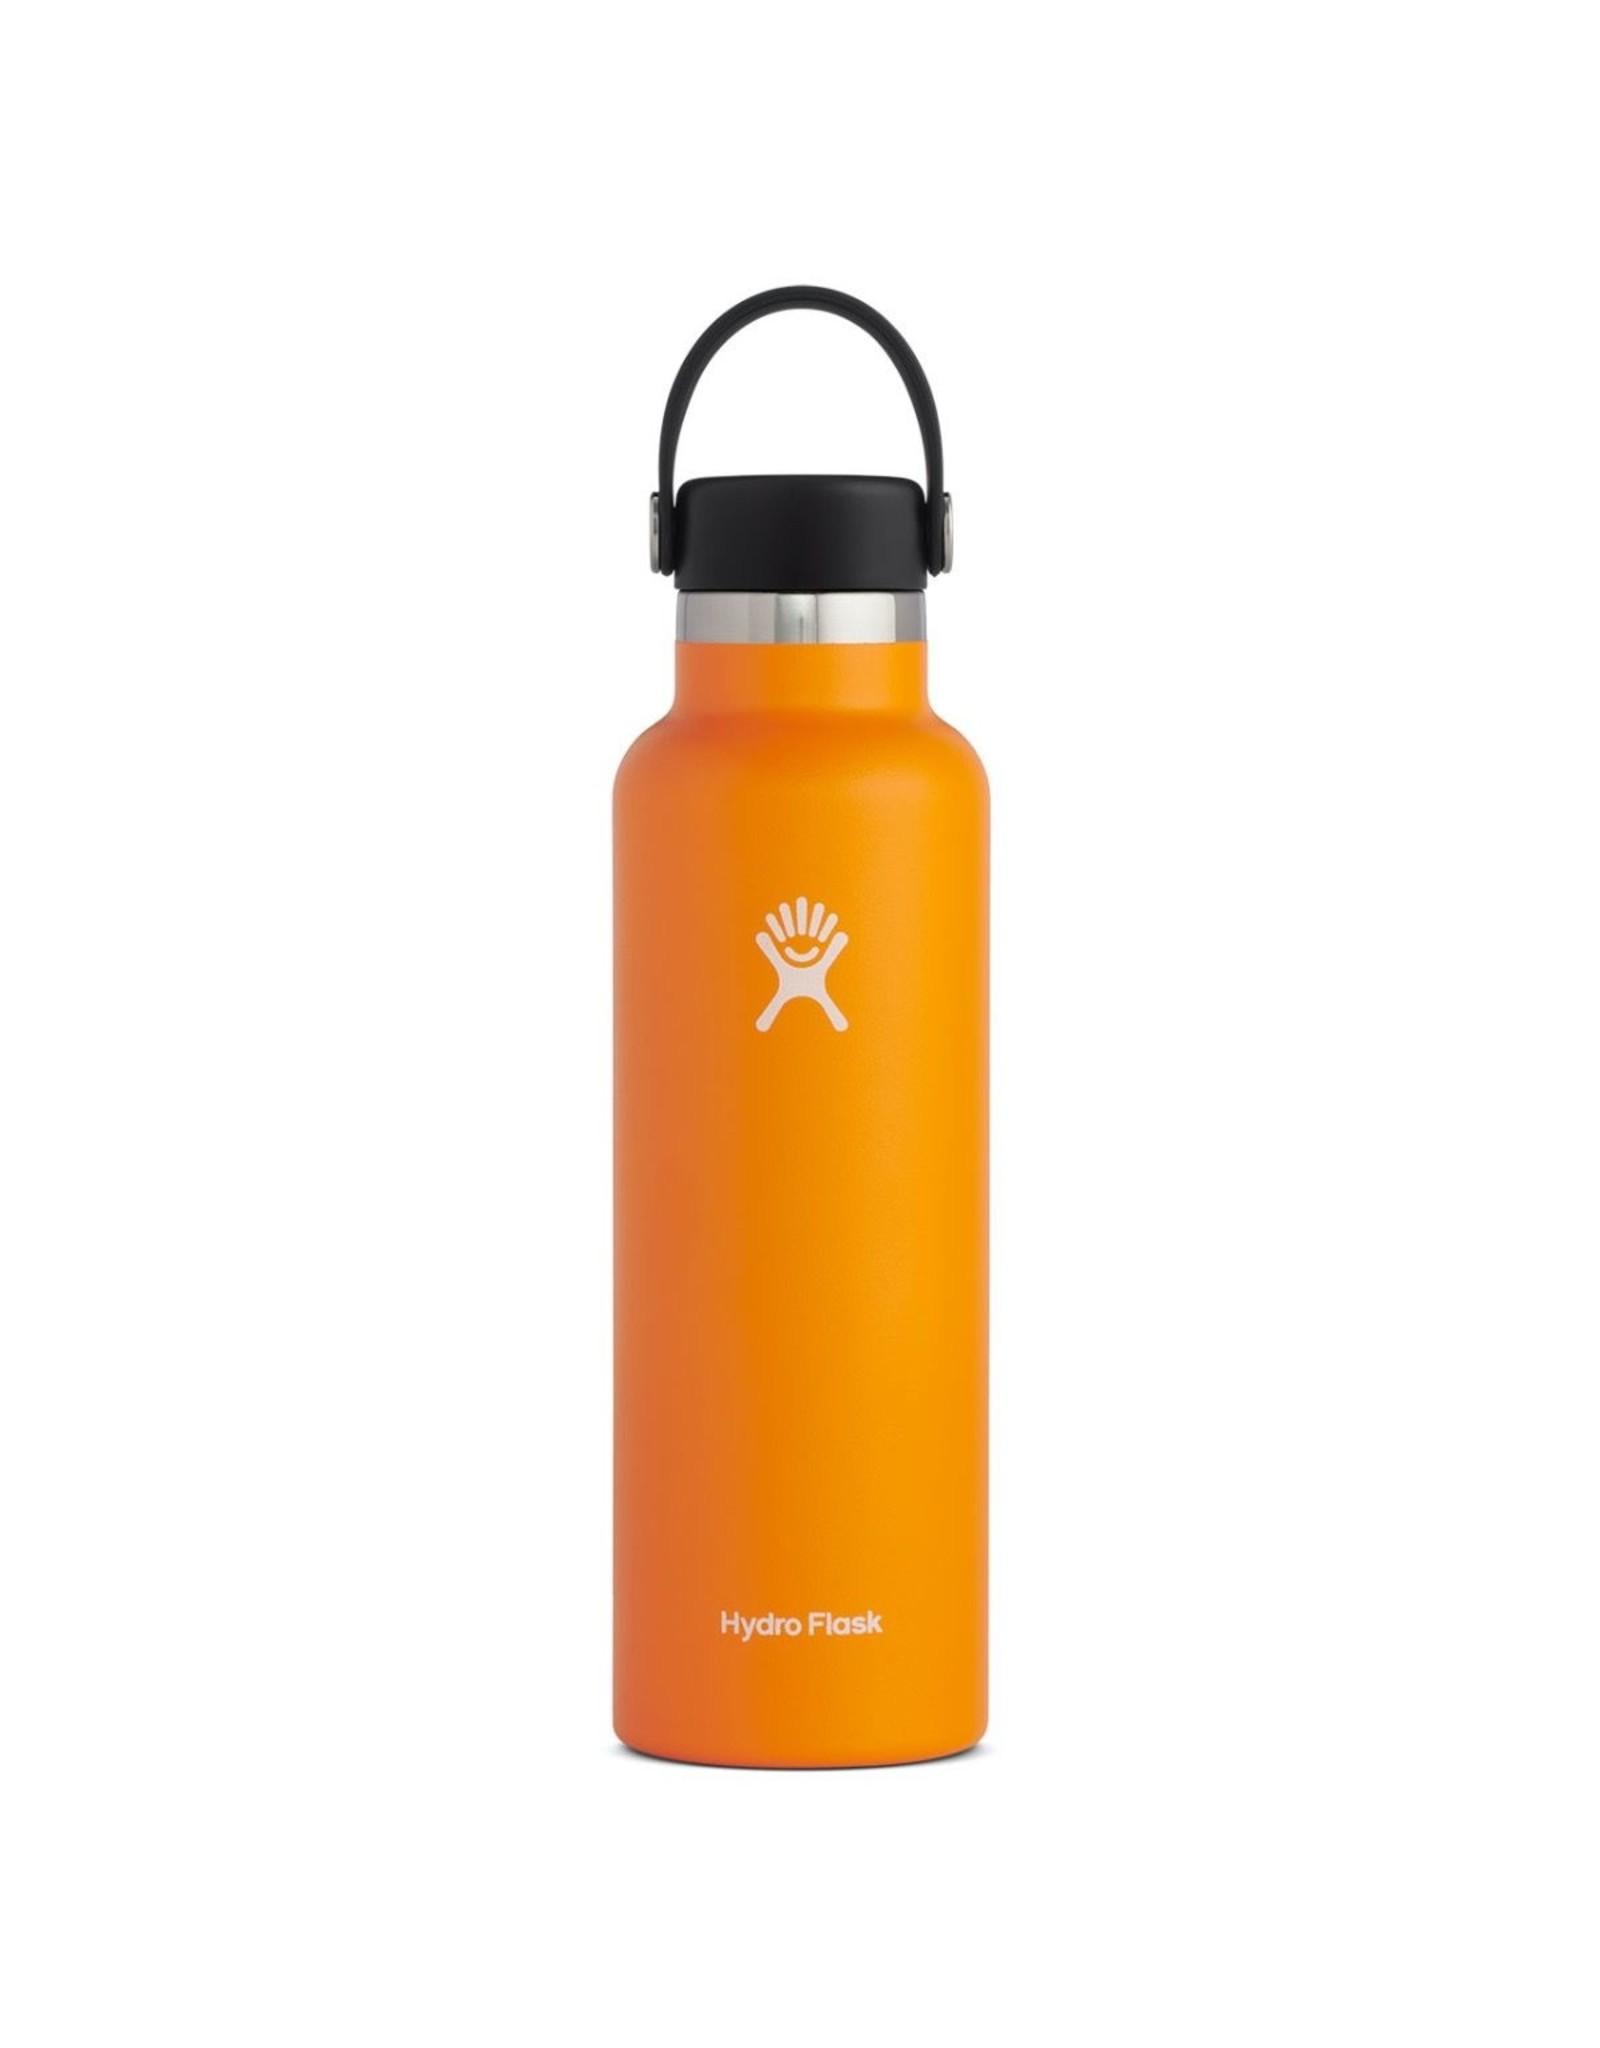 Hydro Flask Hydro Flask 21oz Standard Mouth w/ Flex Cap Clementine